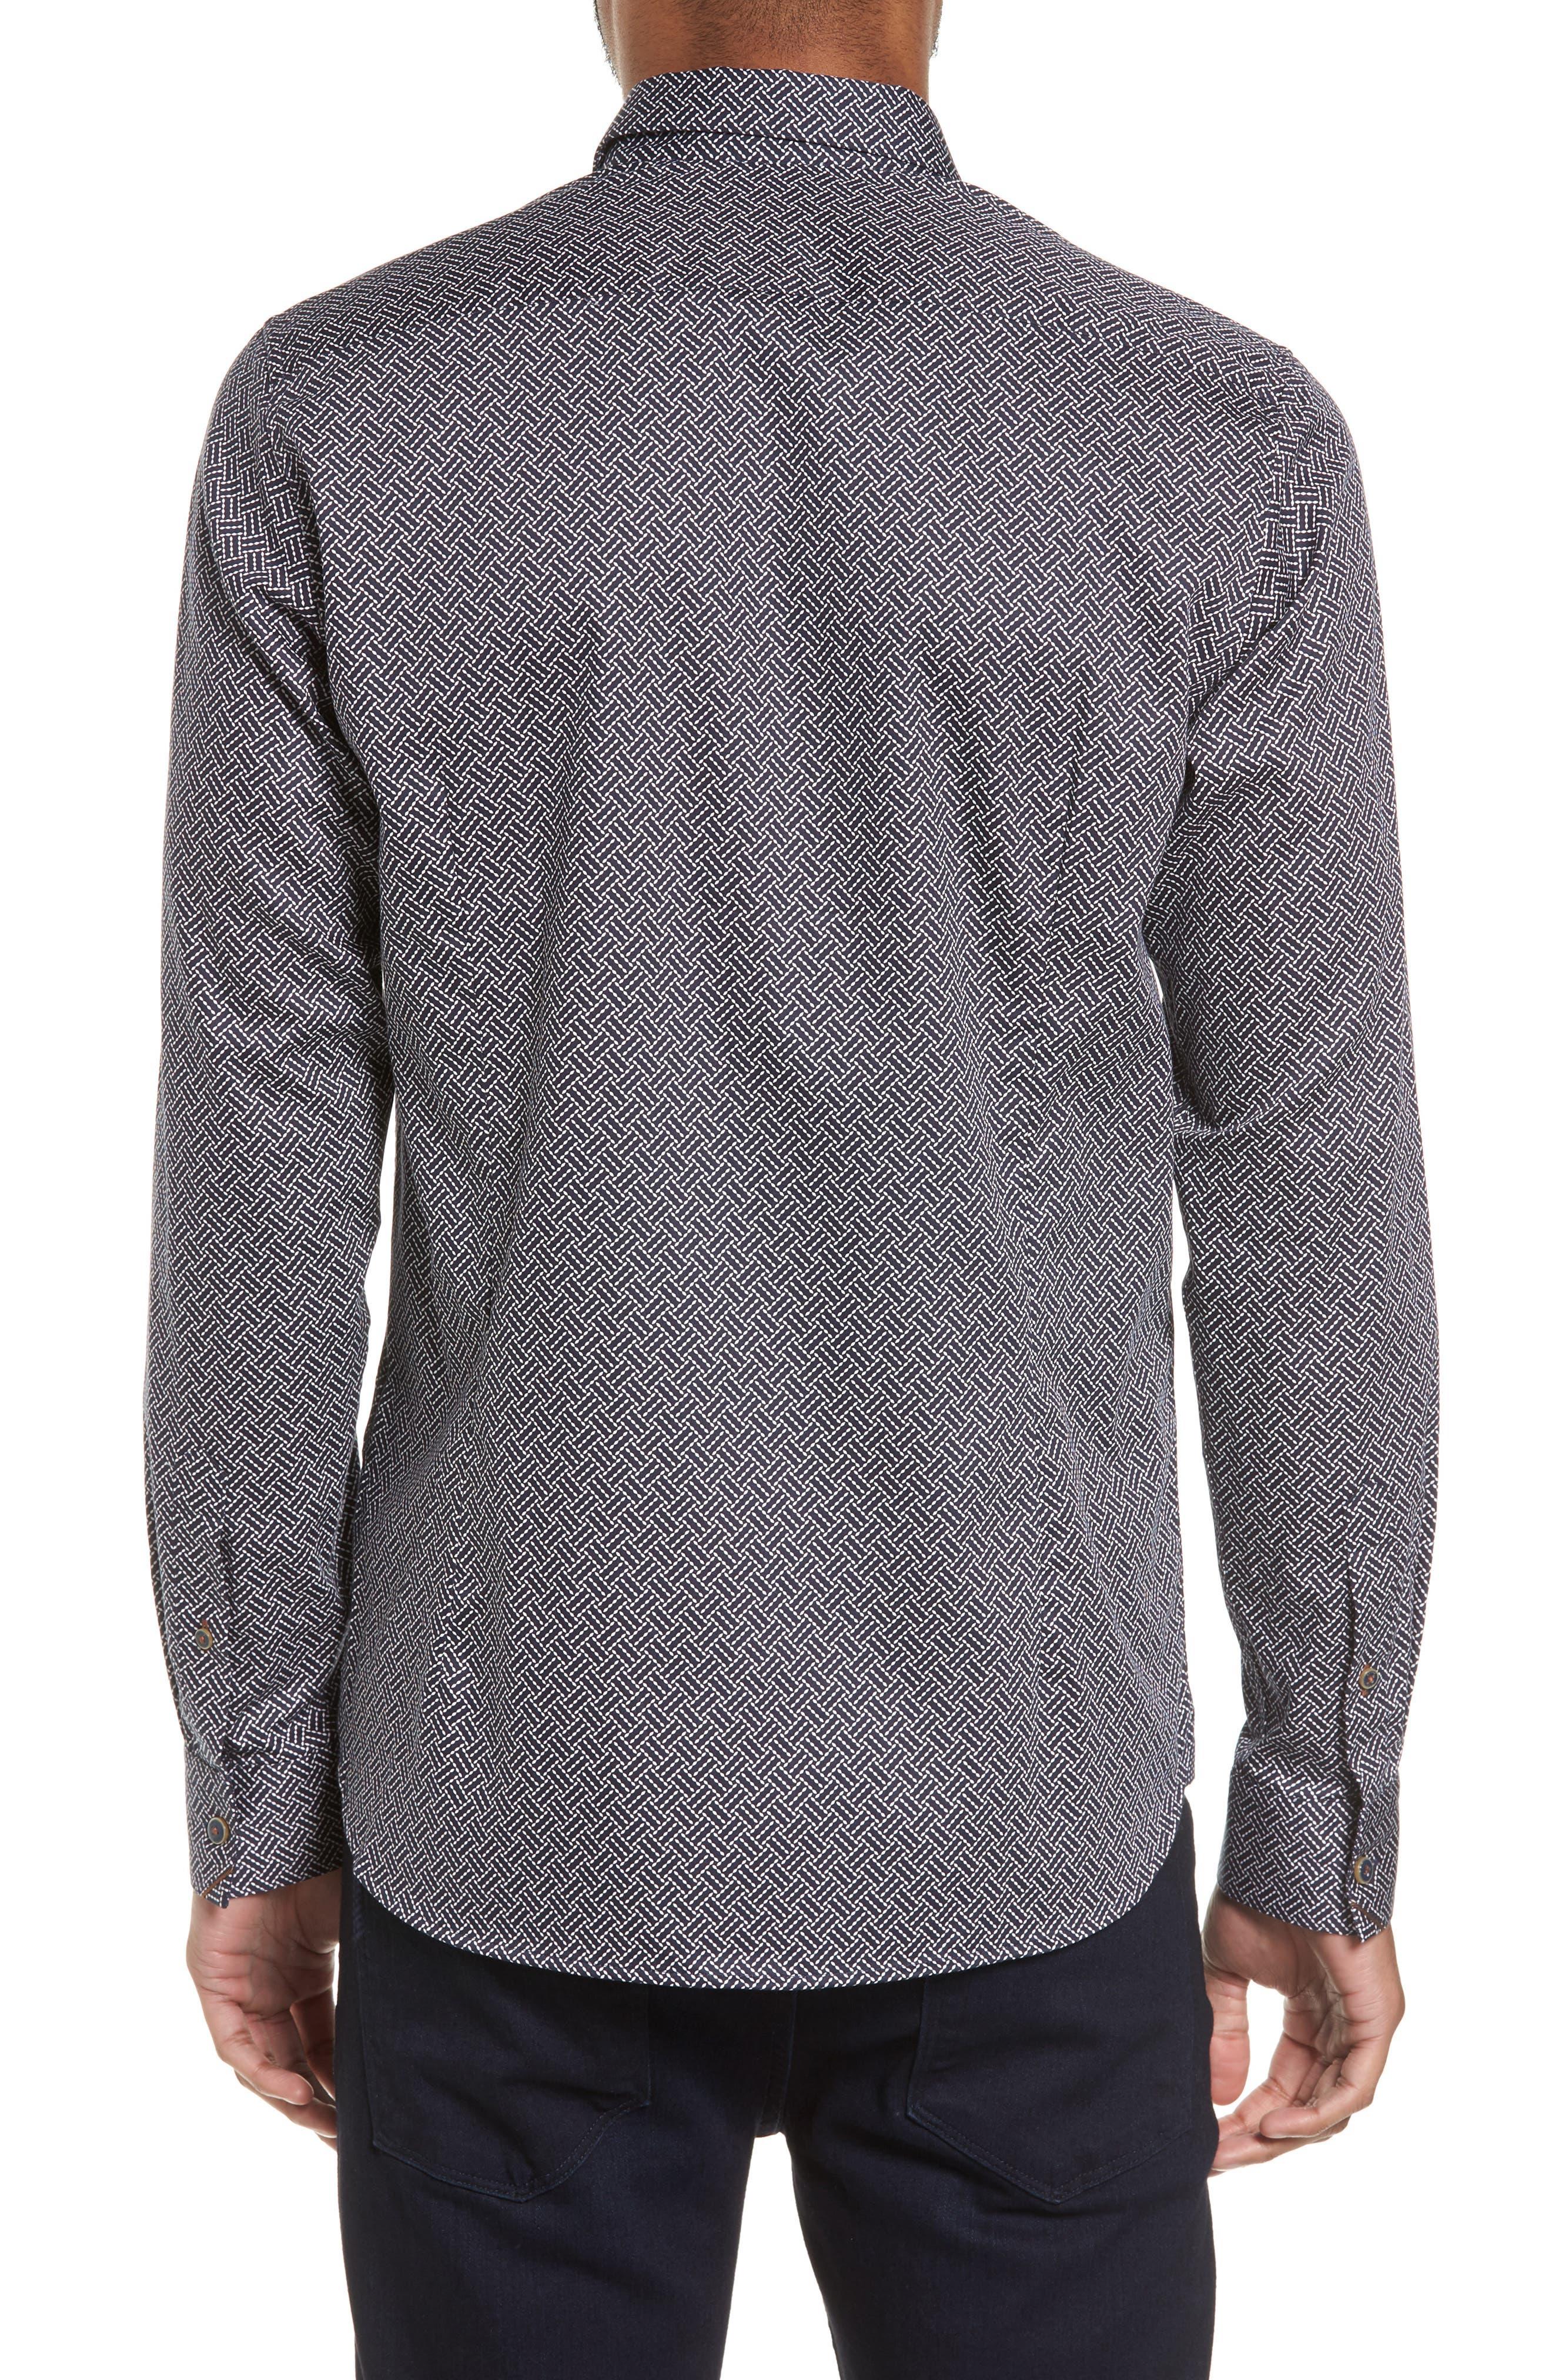 Larosh Slim Fit Basket Weave Print Sport Shirt,                             Alternate thumbnail 2, color,                             Navy